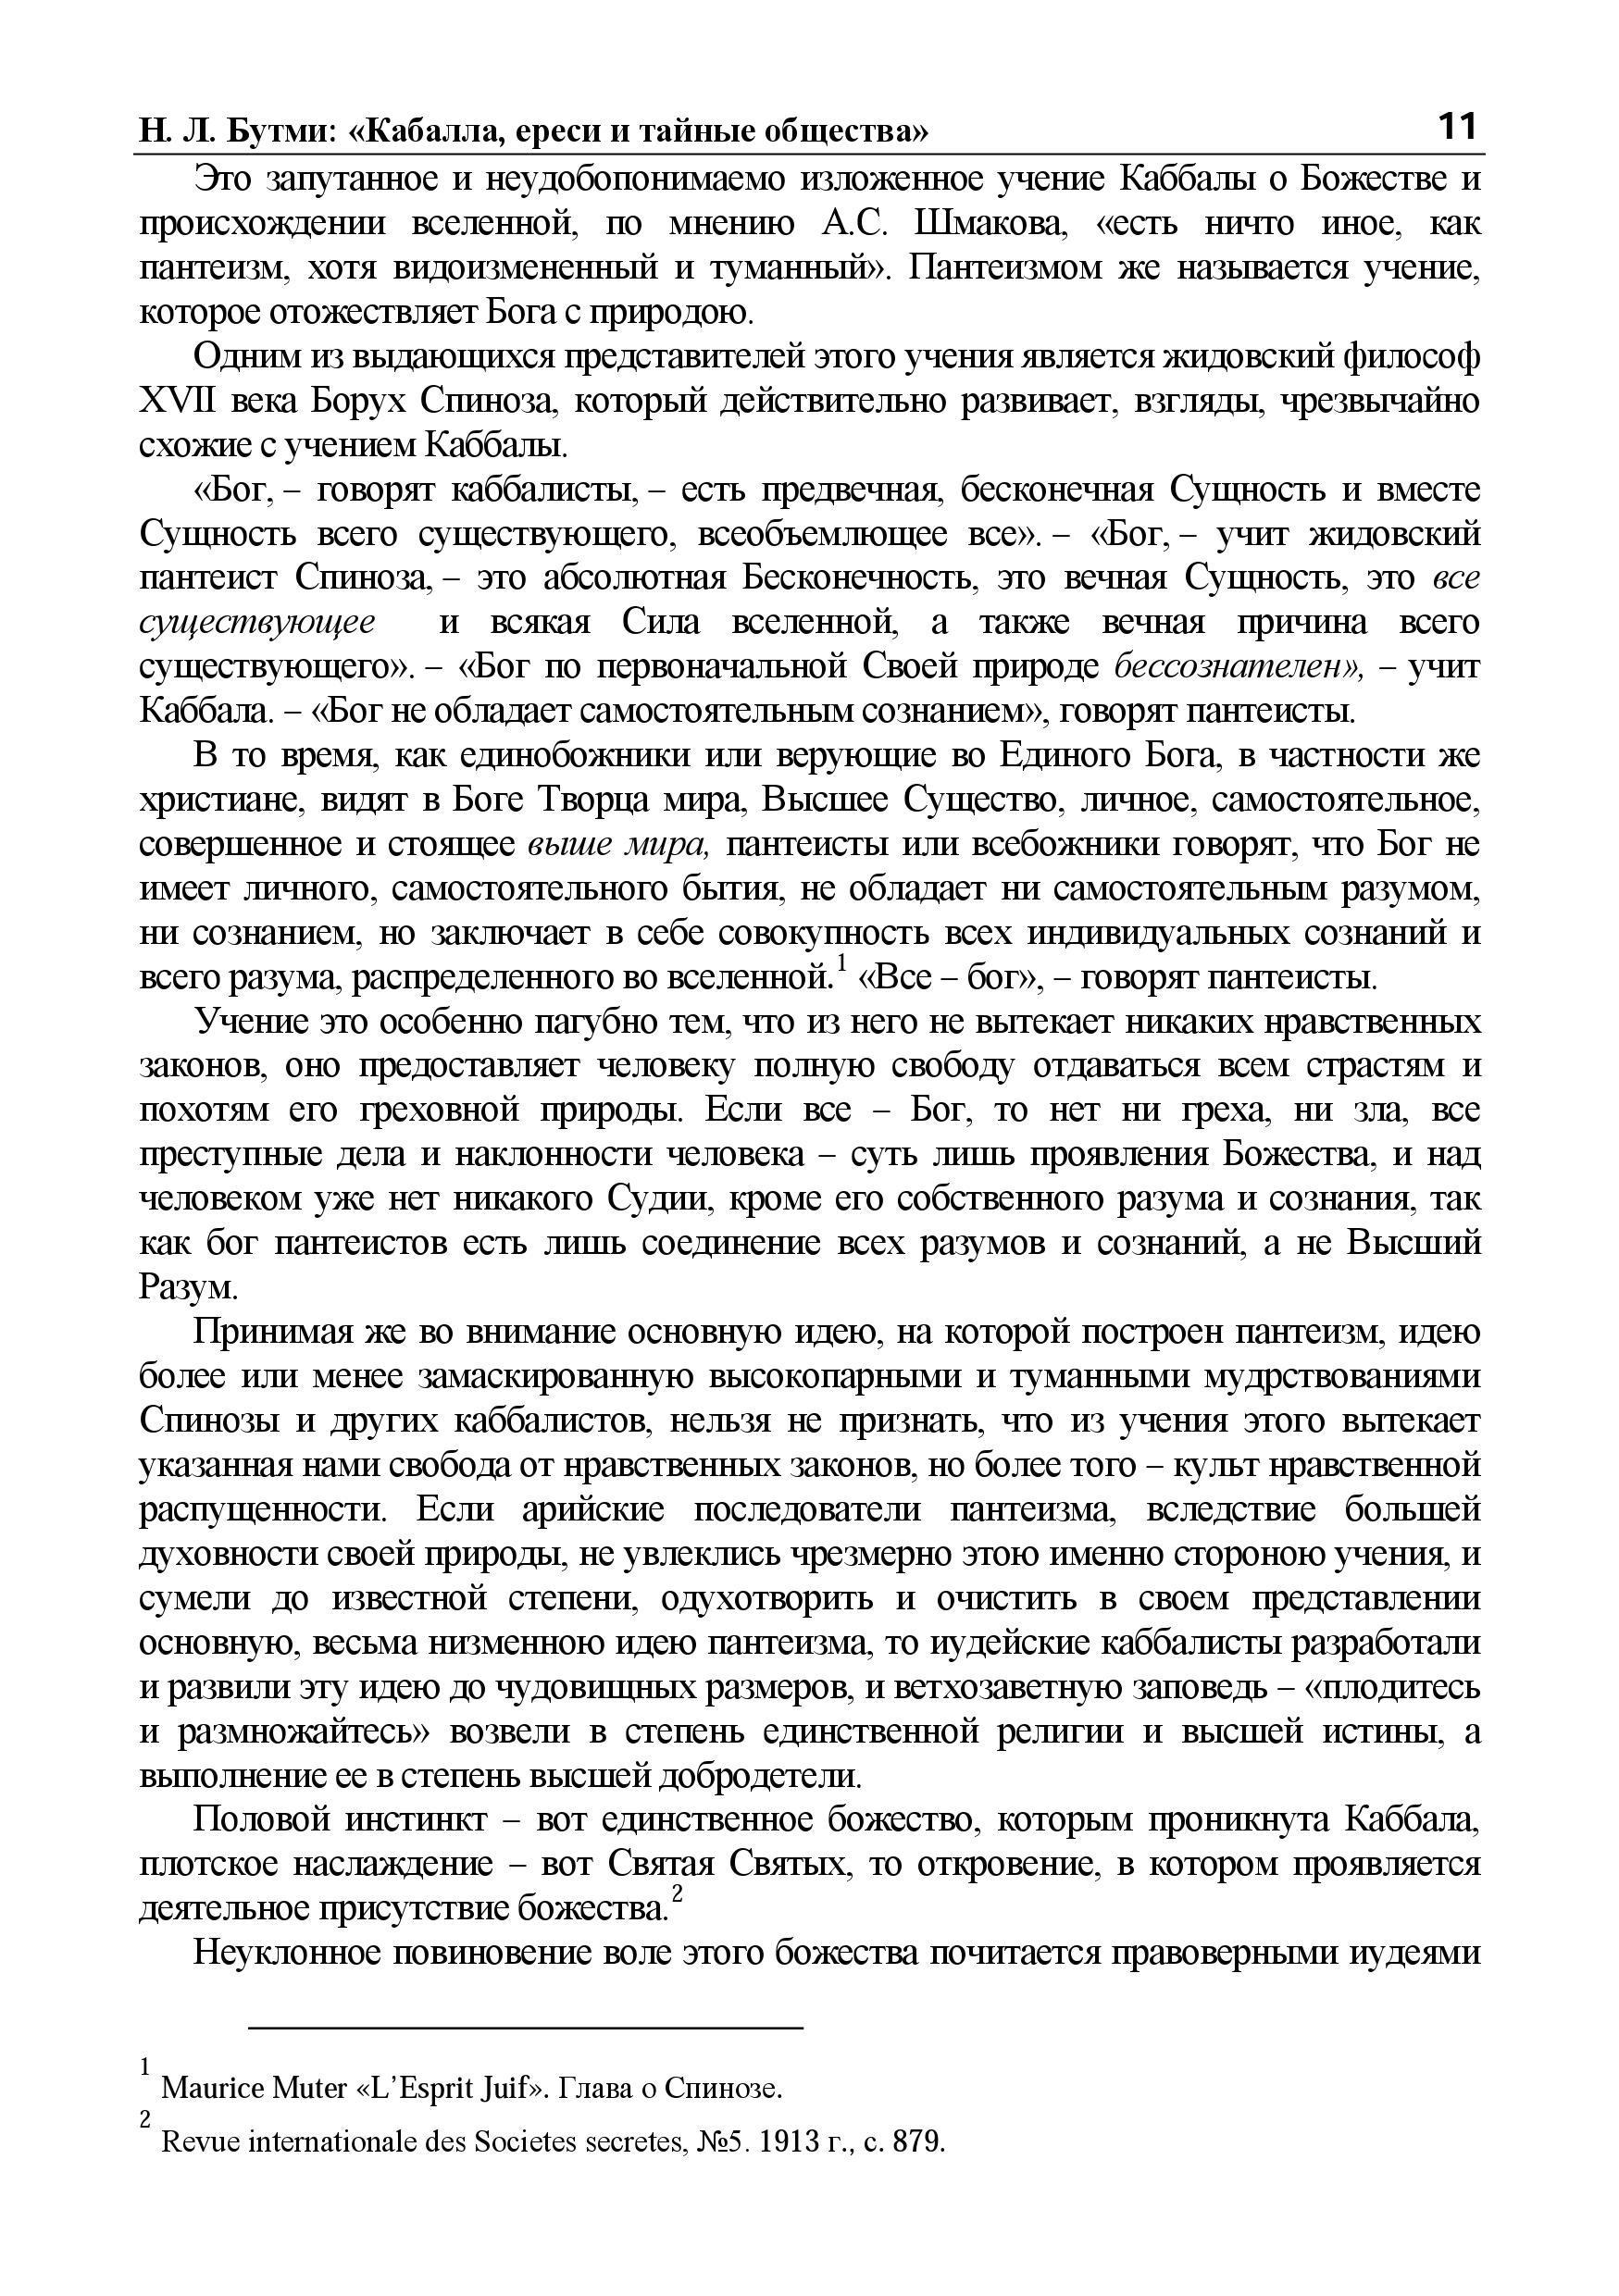 http://sf.uploads.ru/fZauo.jpg